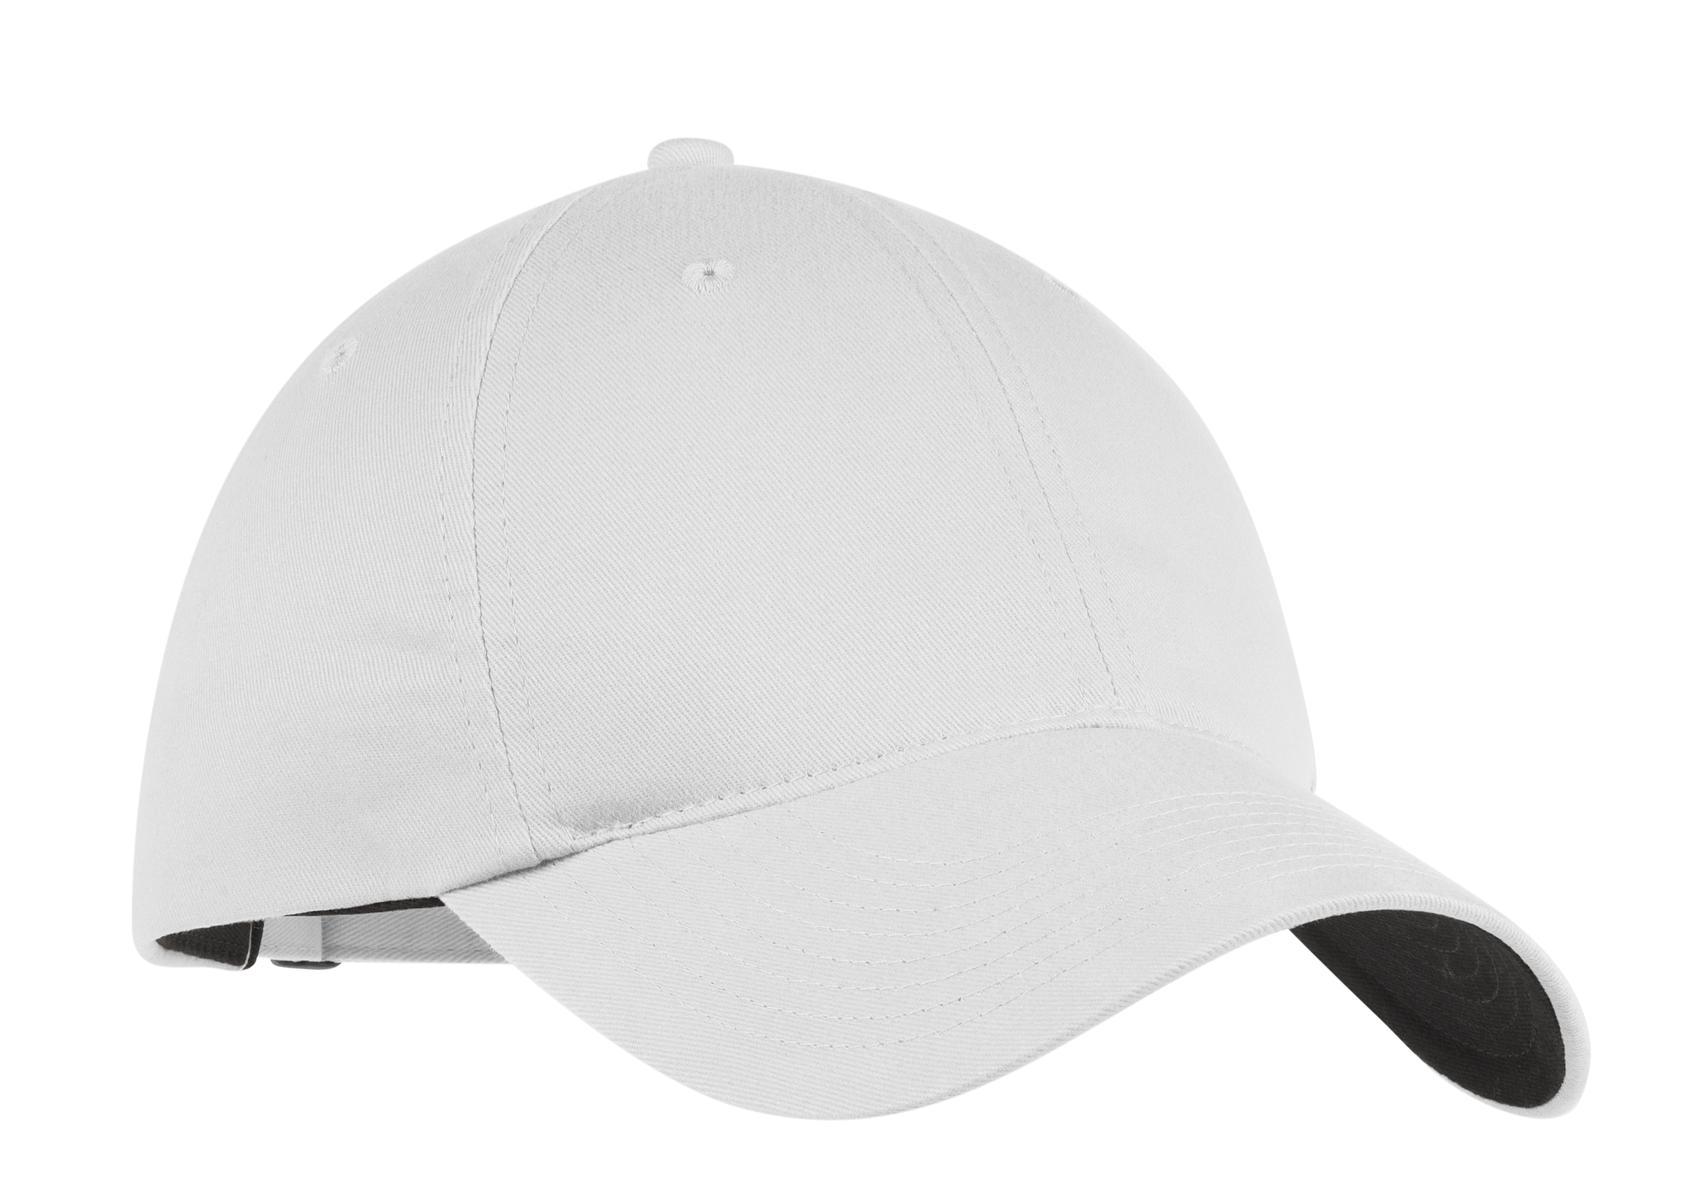 4bdeba47959 Nike Golf - Unstructured Twill Cap - Discontinued LJ 02 21.